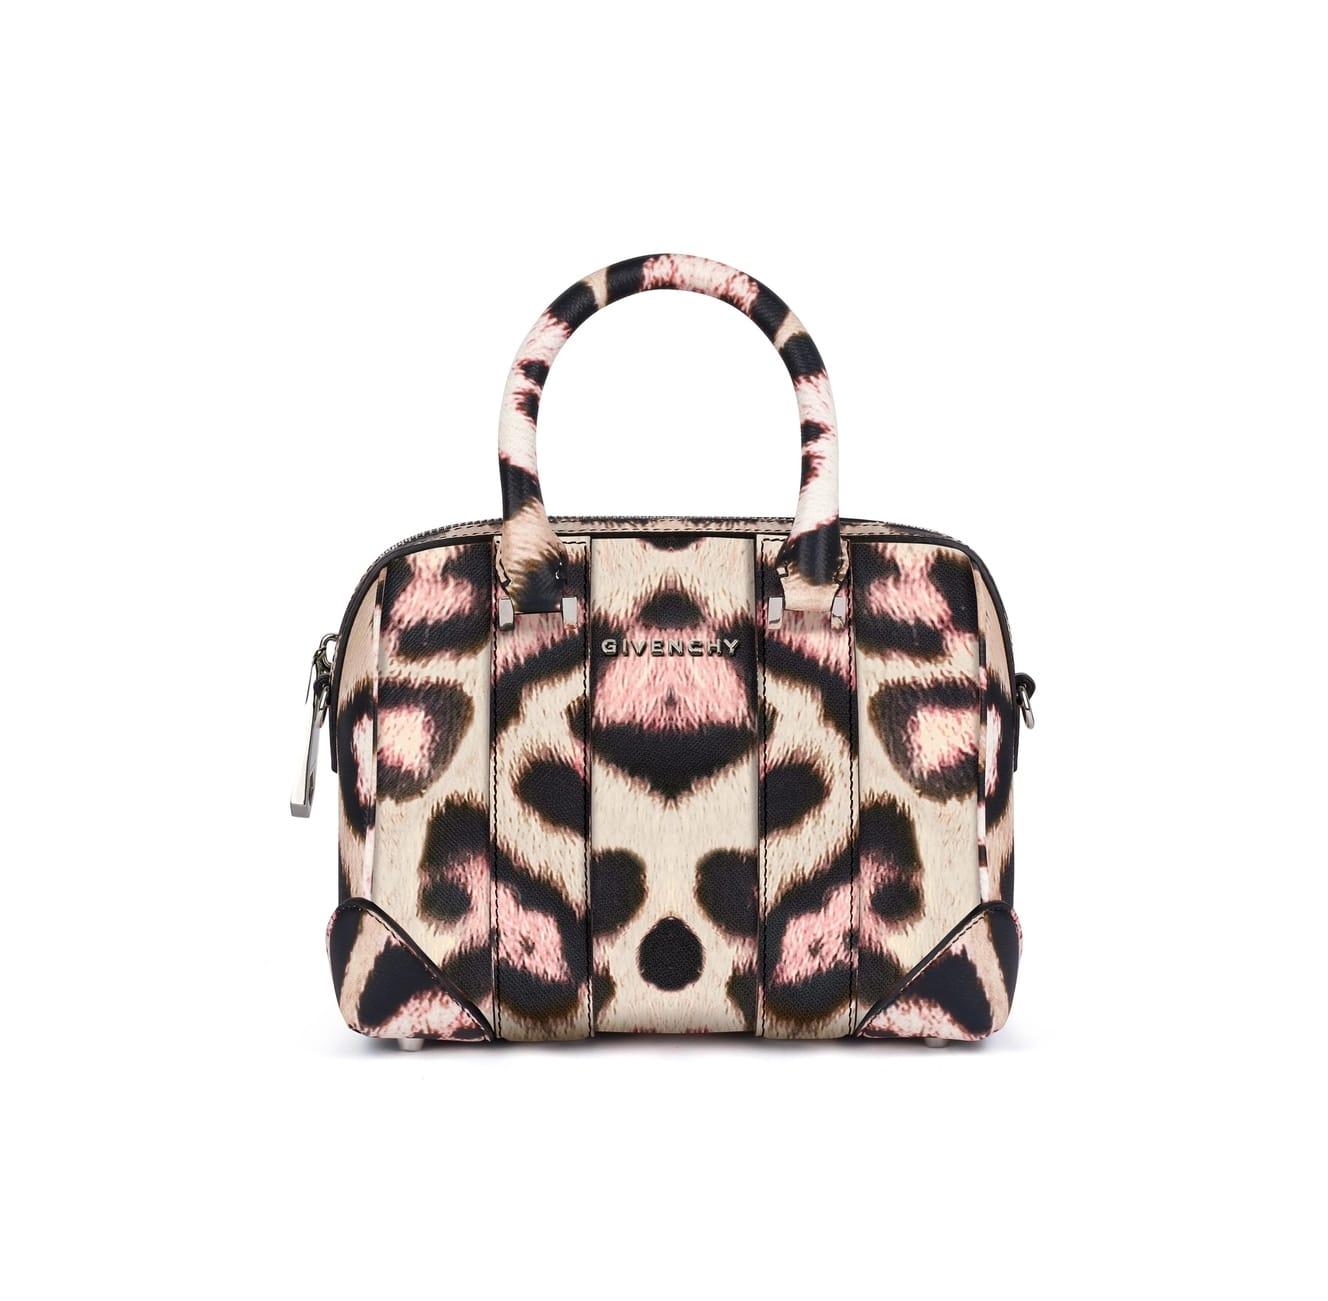 bag lyst product givenchy pinkmulti bags in jaguar gallery pandora mini printed normal pink handbags leather